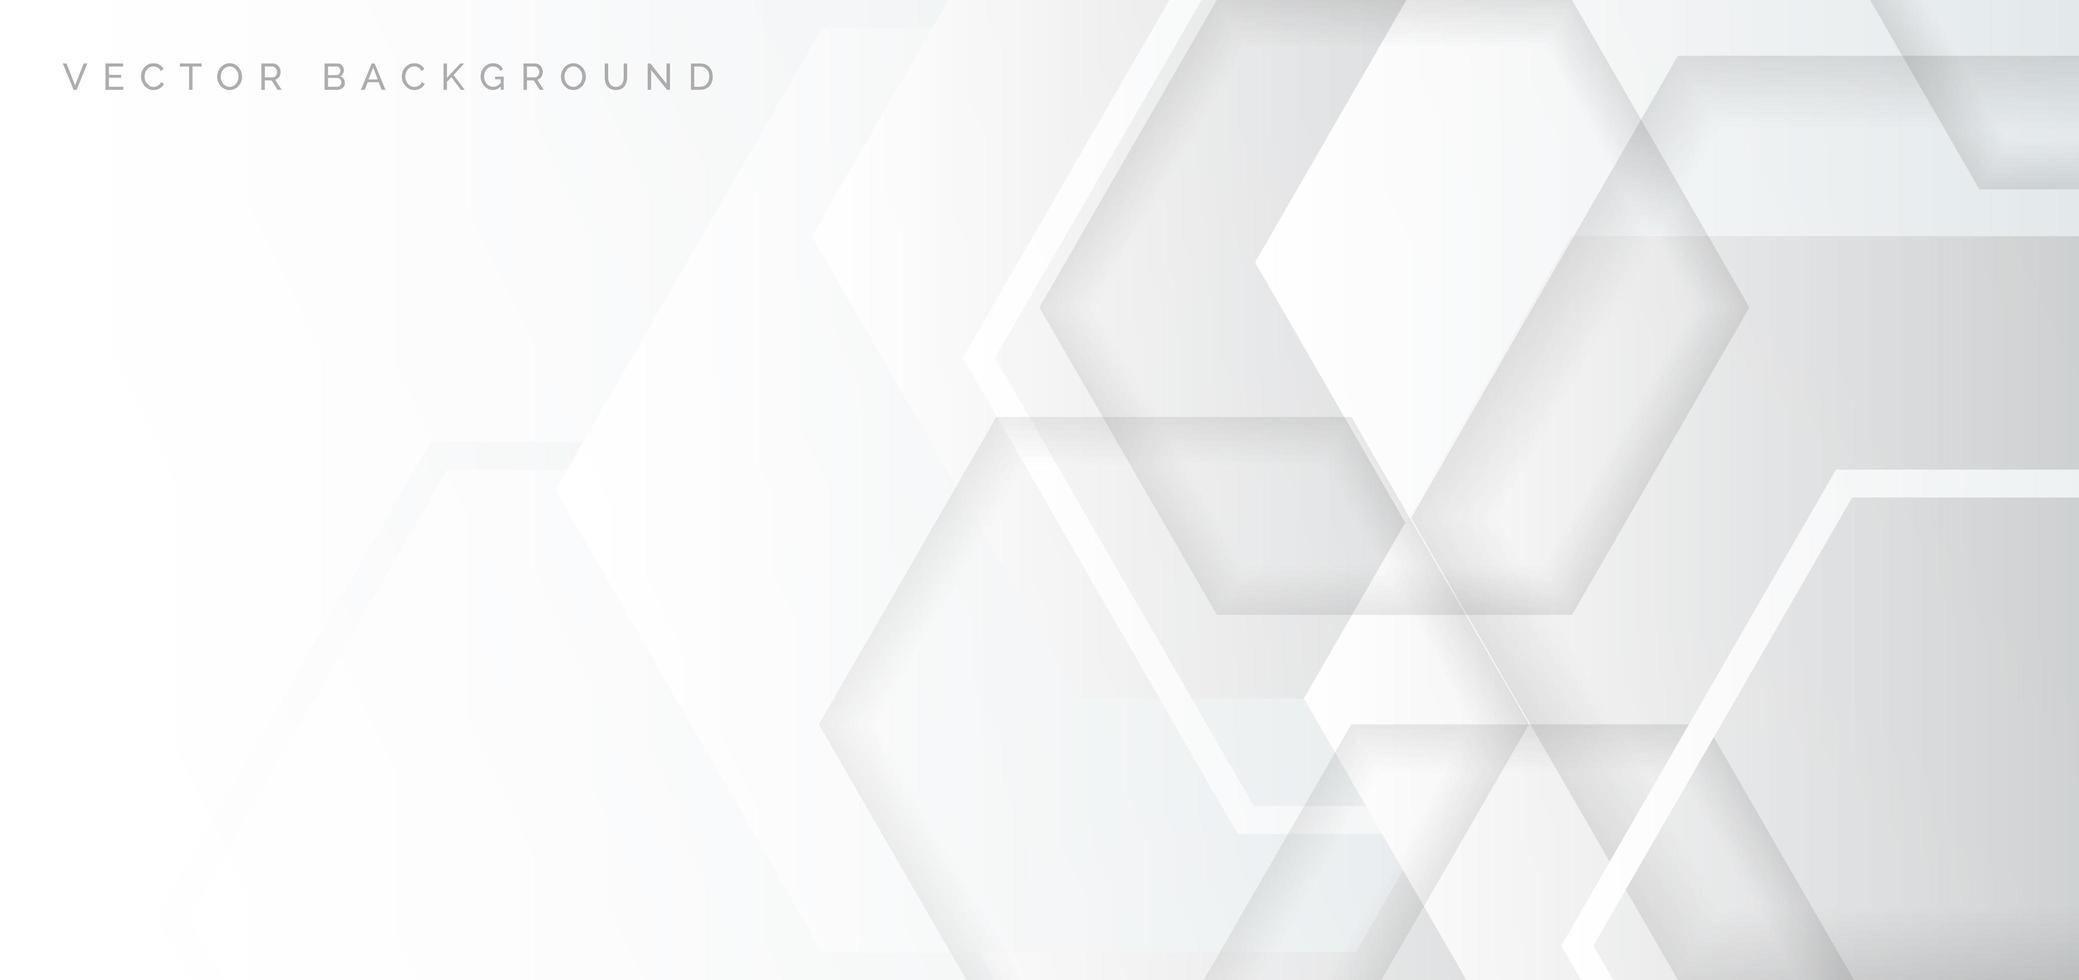 vit, grå geometrisk överlappande hexagon banner vektor